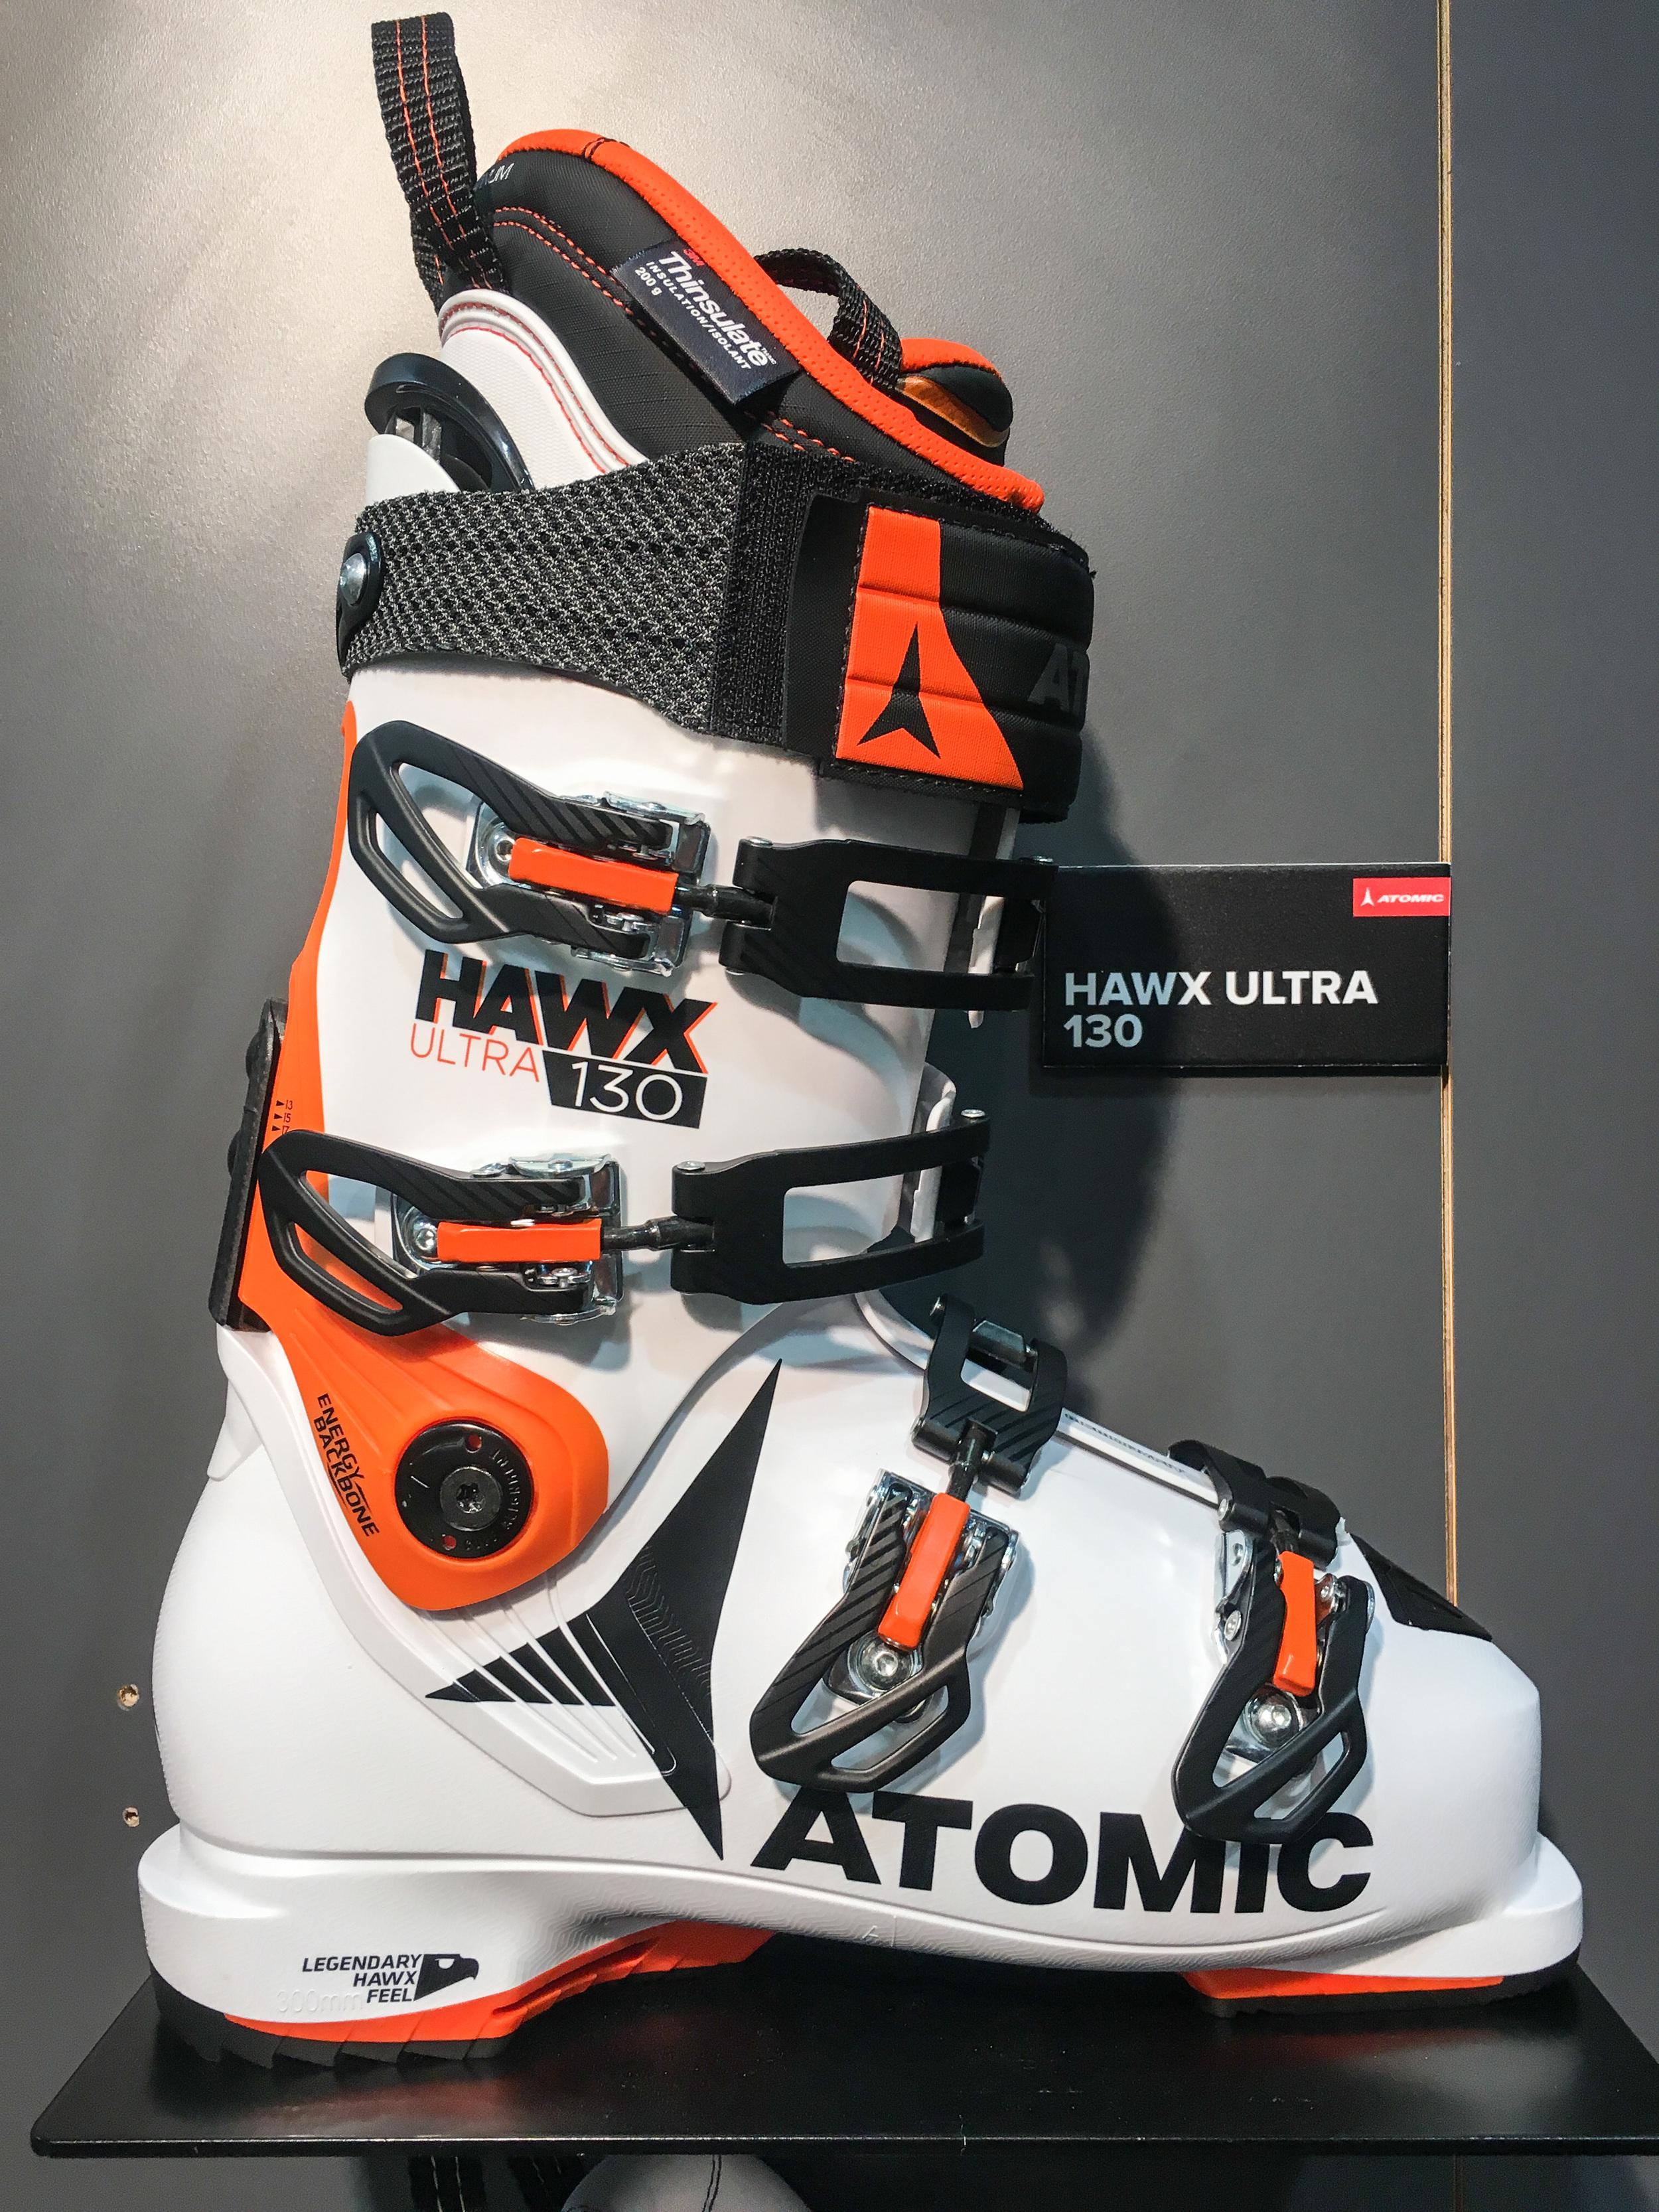 ATOMIC HAWX ULTRA 130 SKI BOOT, $850